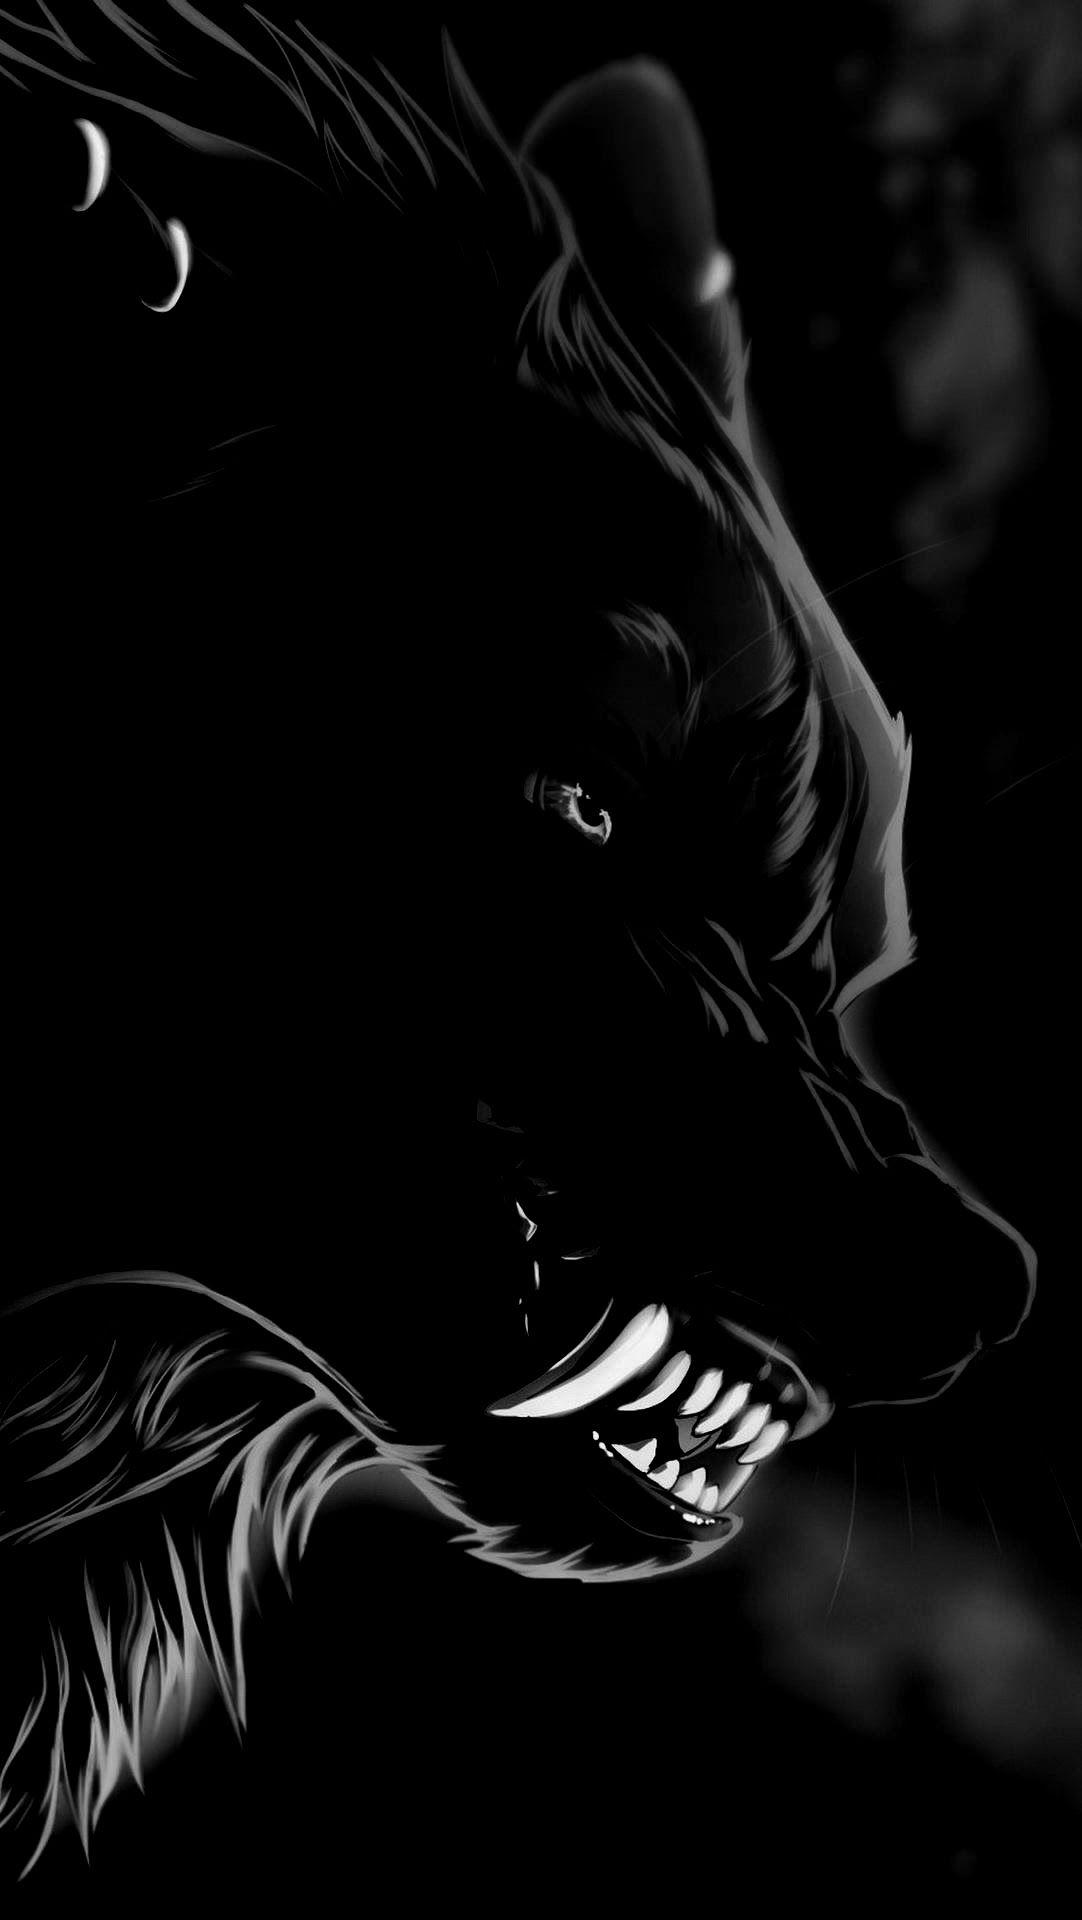 Dark Screen Wallpapers On Wallpaperdog